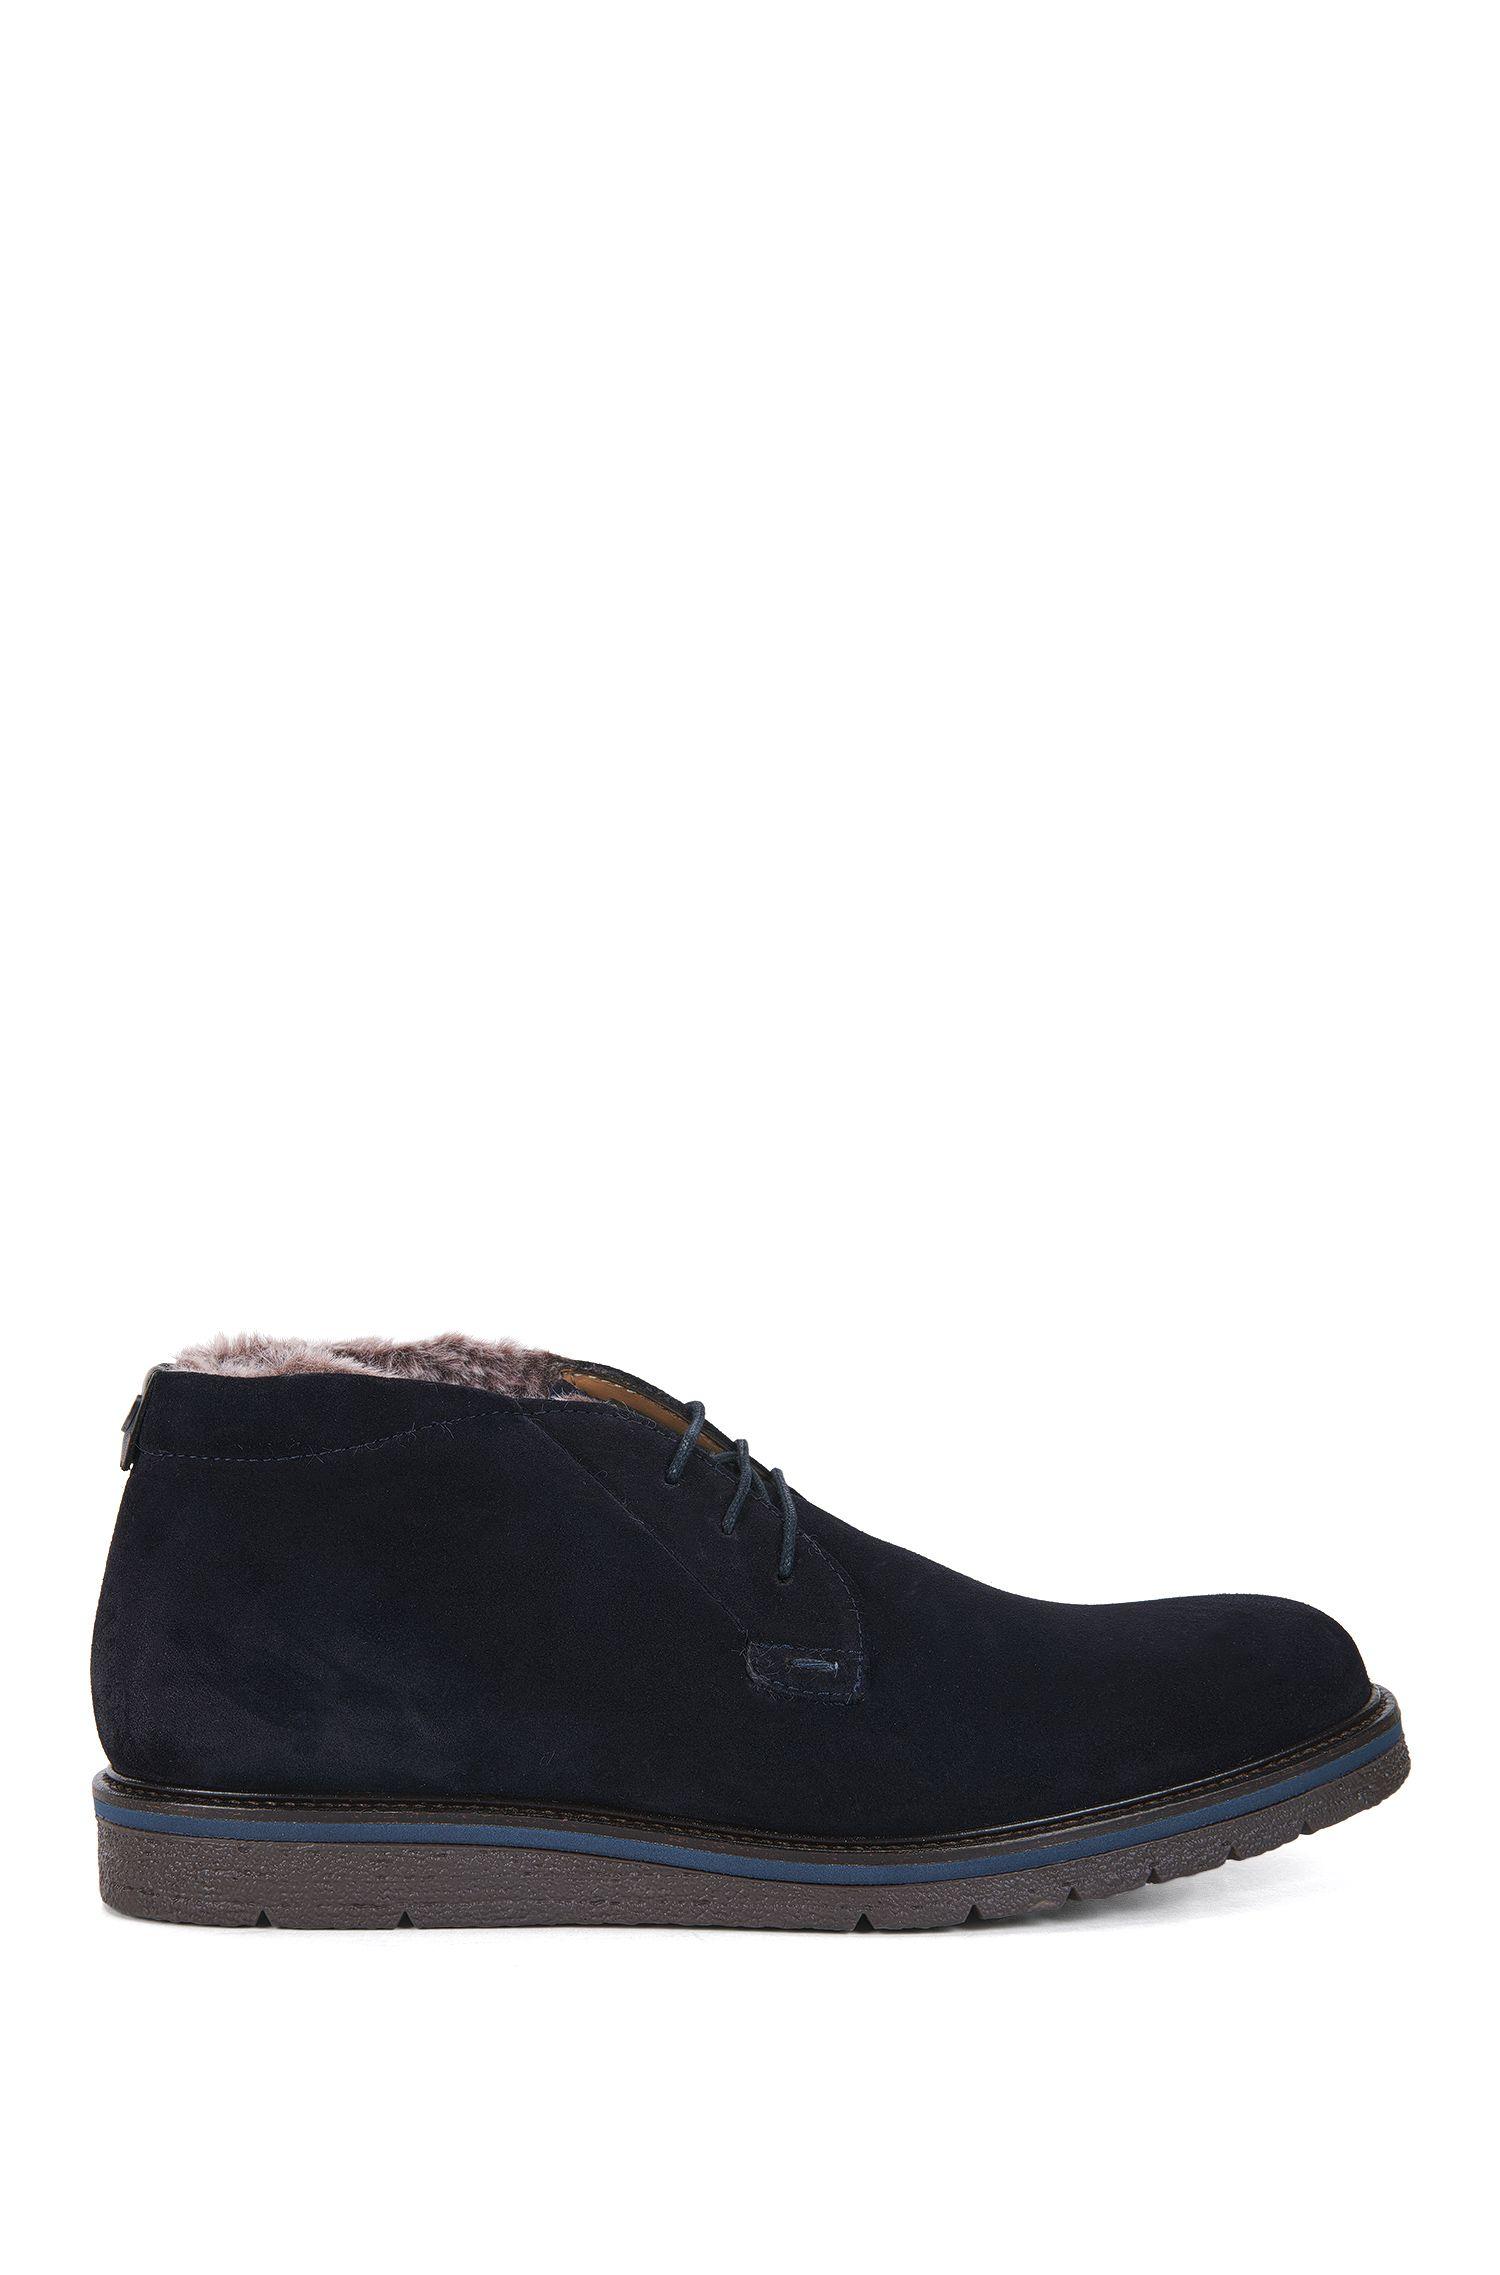 Fur-Lined Suede Desert Boot | Tuned Desb Sdfur, Dark Blue